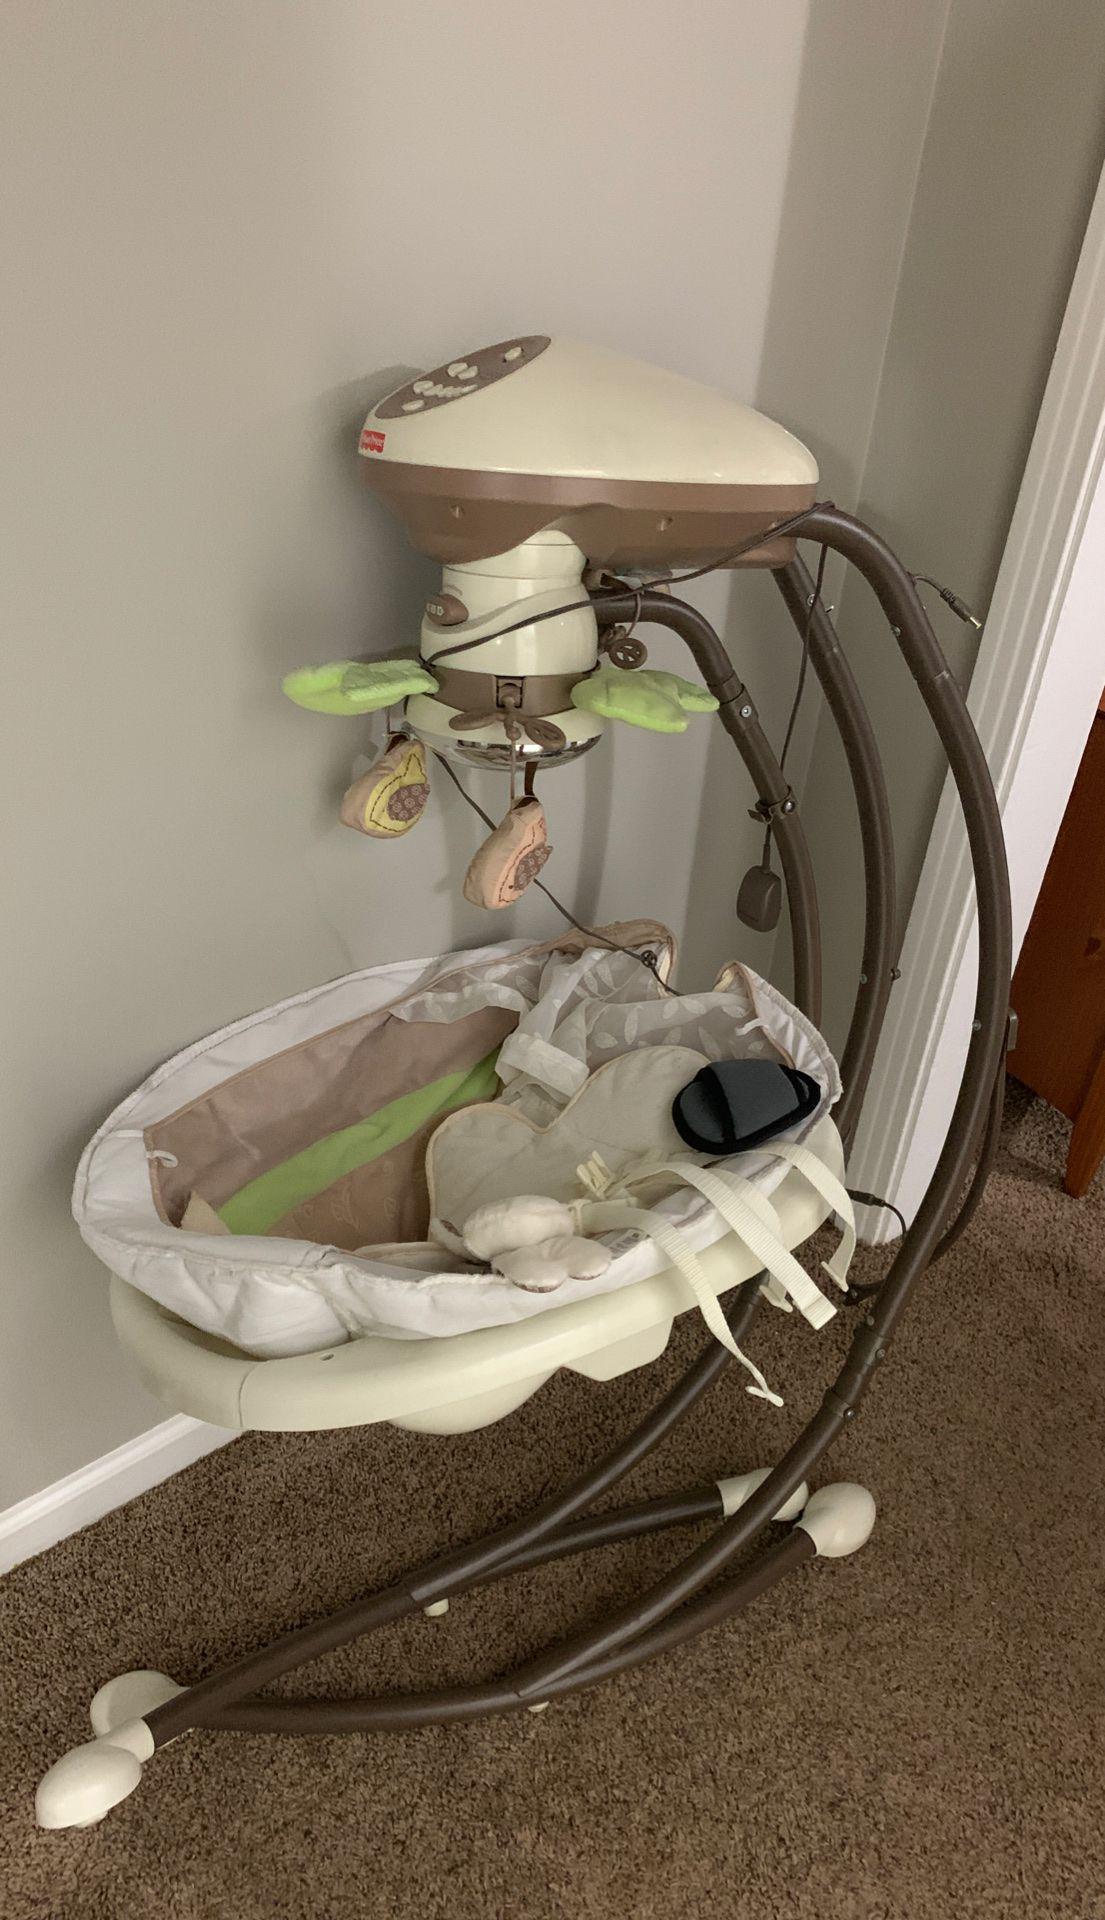 Fisher-Price My Little Snugabunny Cradle 'n Swing with 6-Speeds